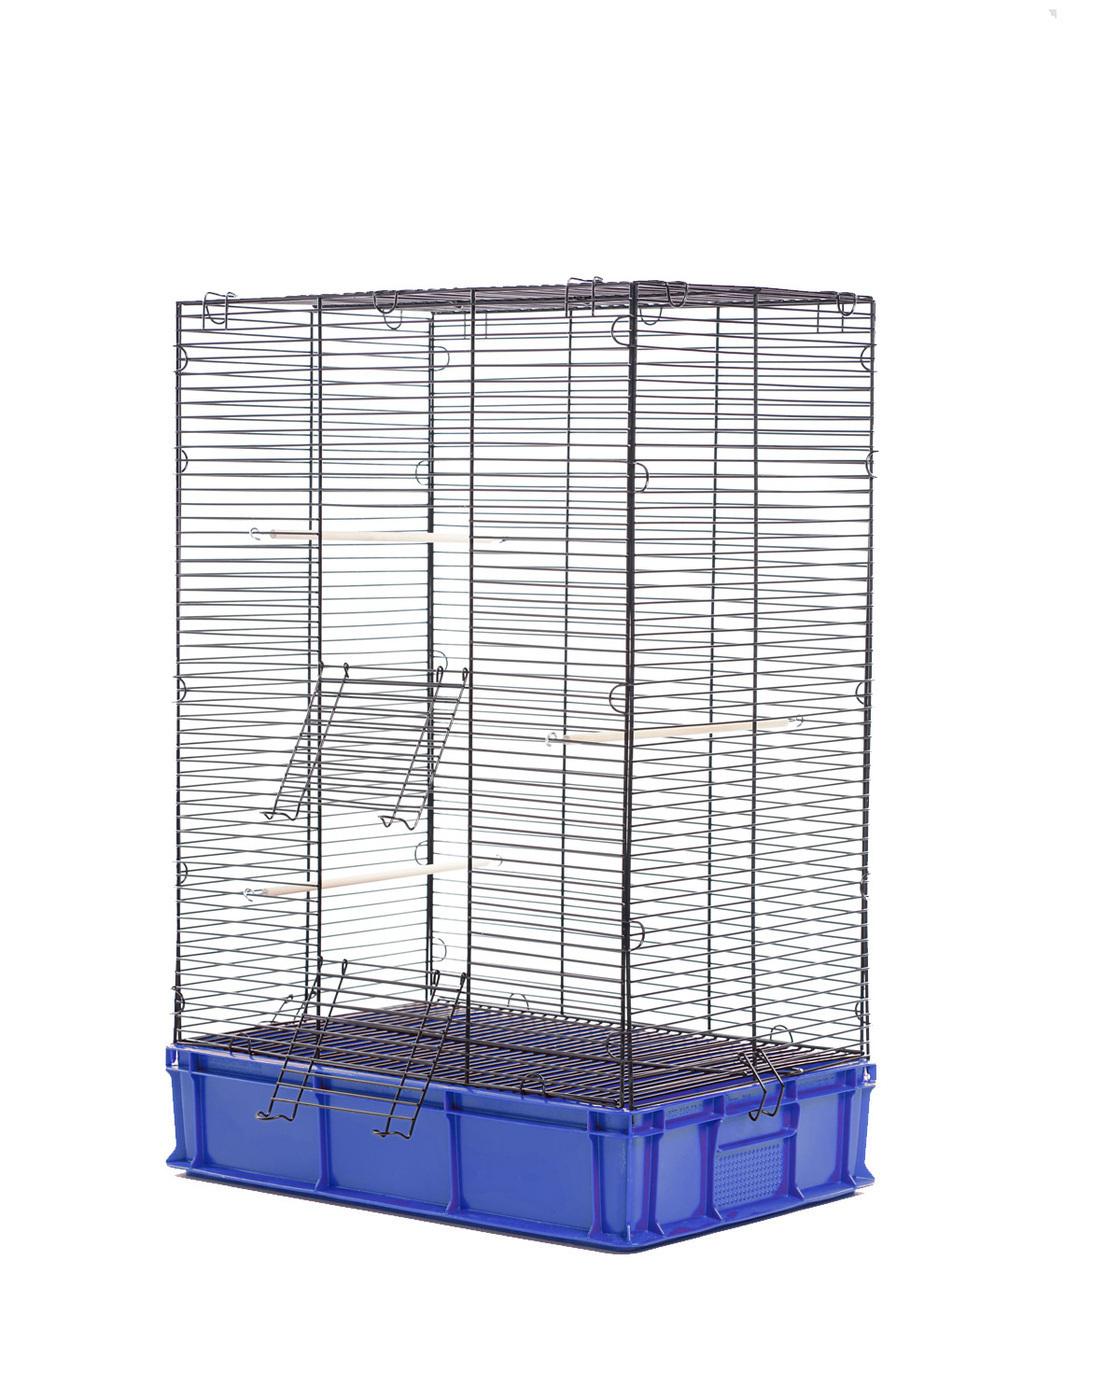 клетка для птиц, попугаев, высокая roklet, размер xl 56х38х88 уцененный товар (№1)